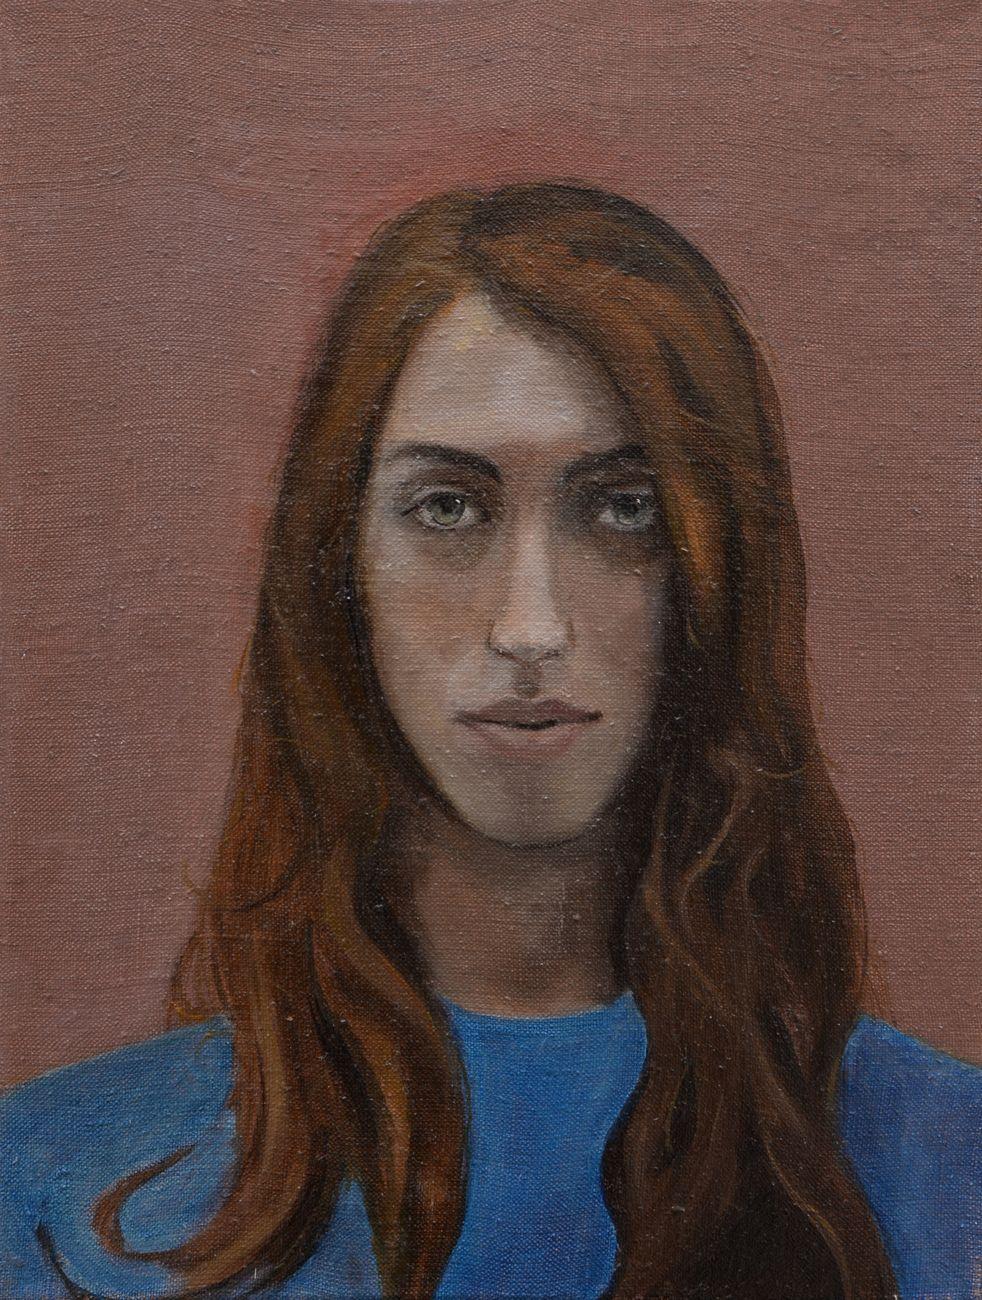 Beatrice Alici, Selfies n. 6, 2018, olio su lino, 30x40 cm